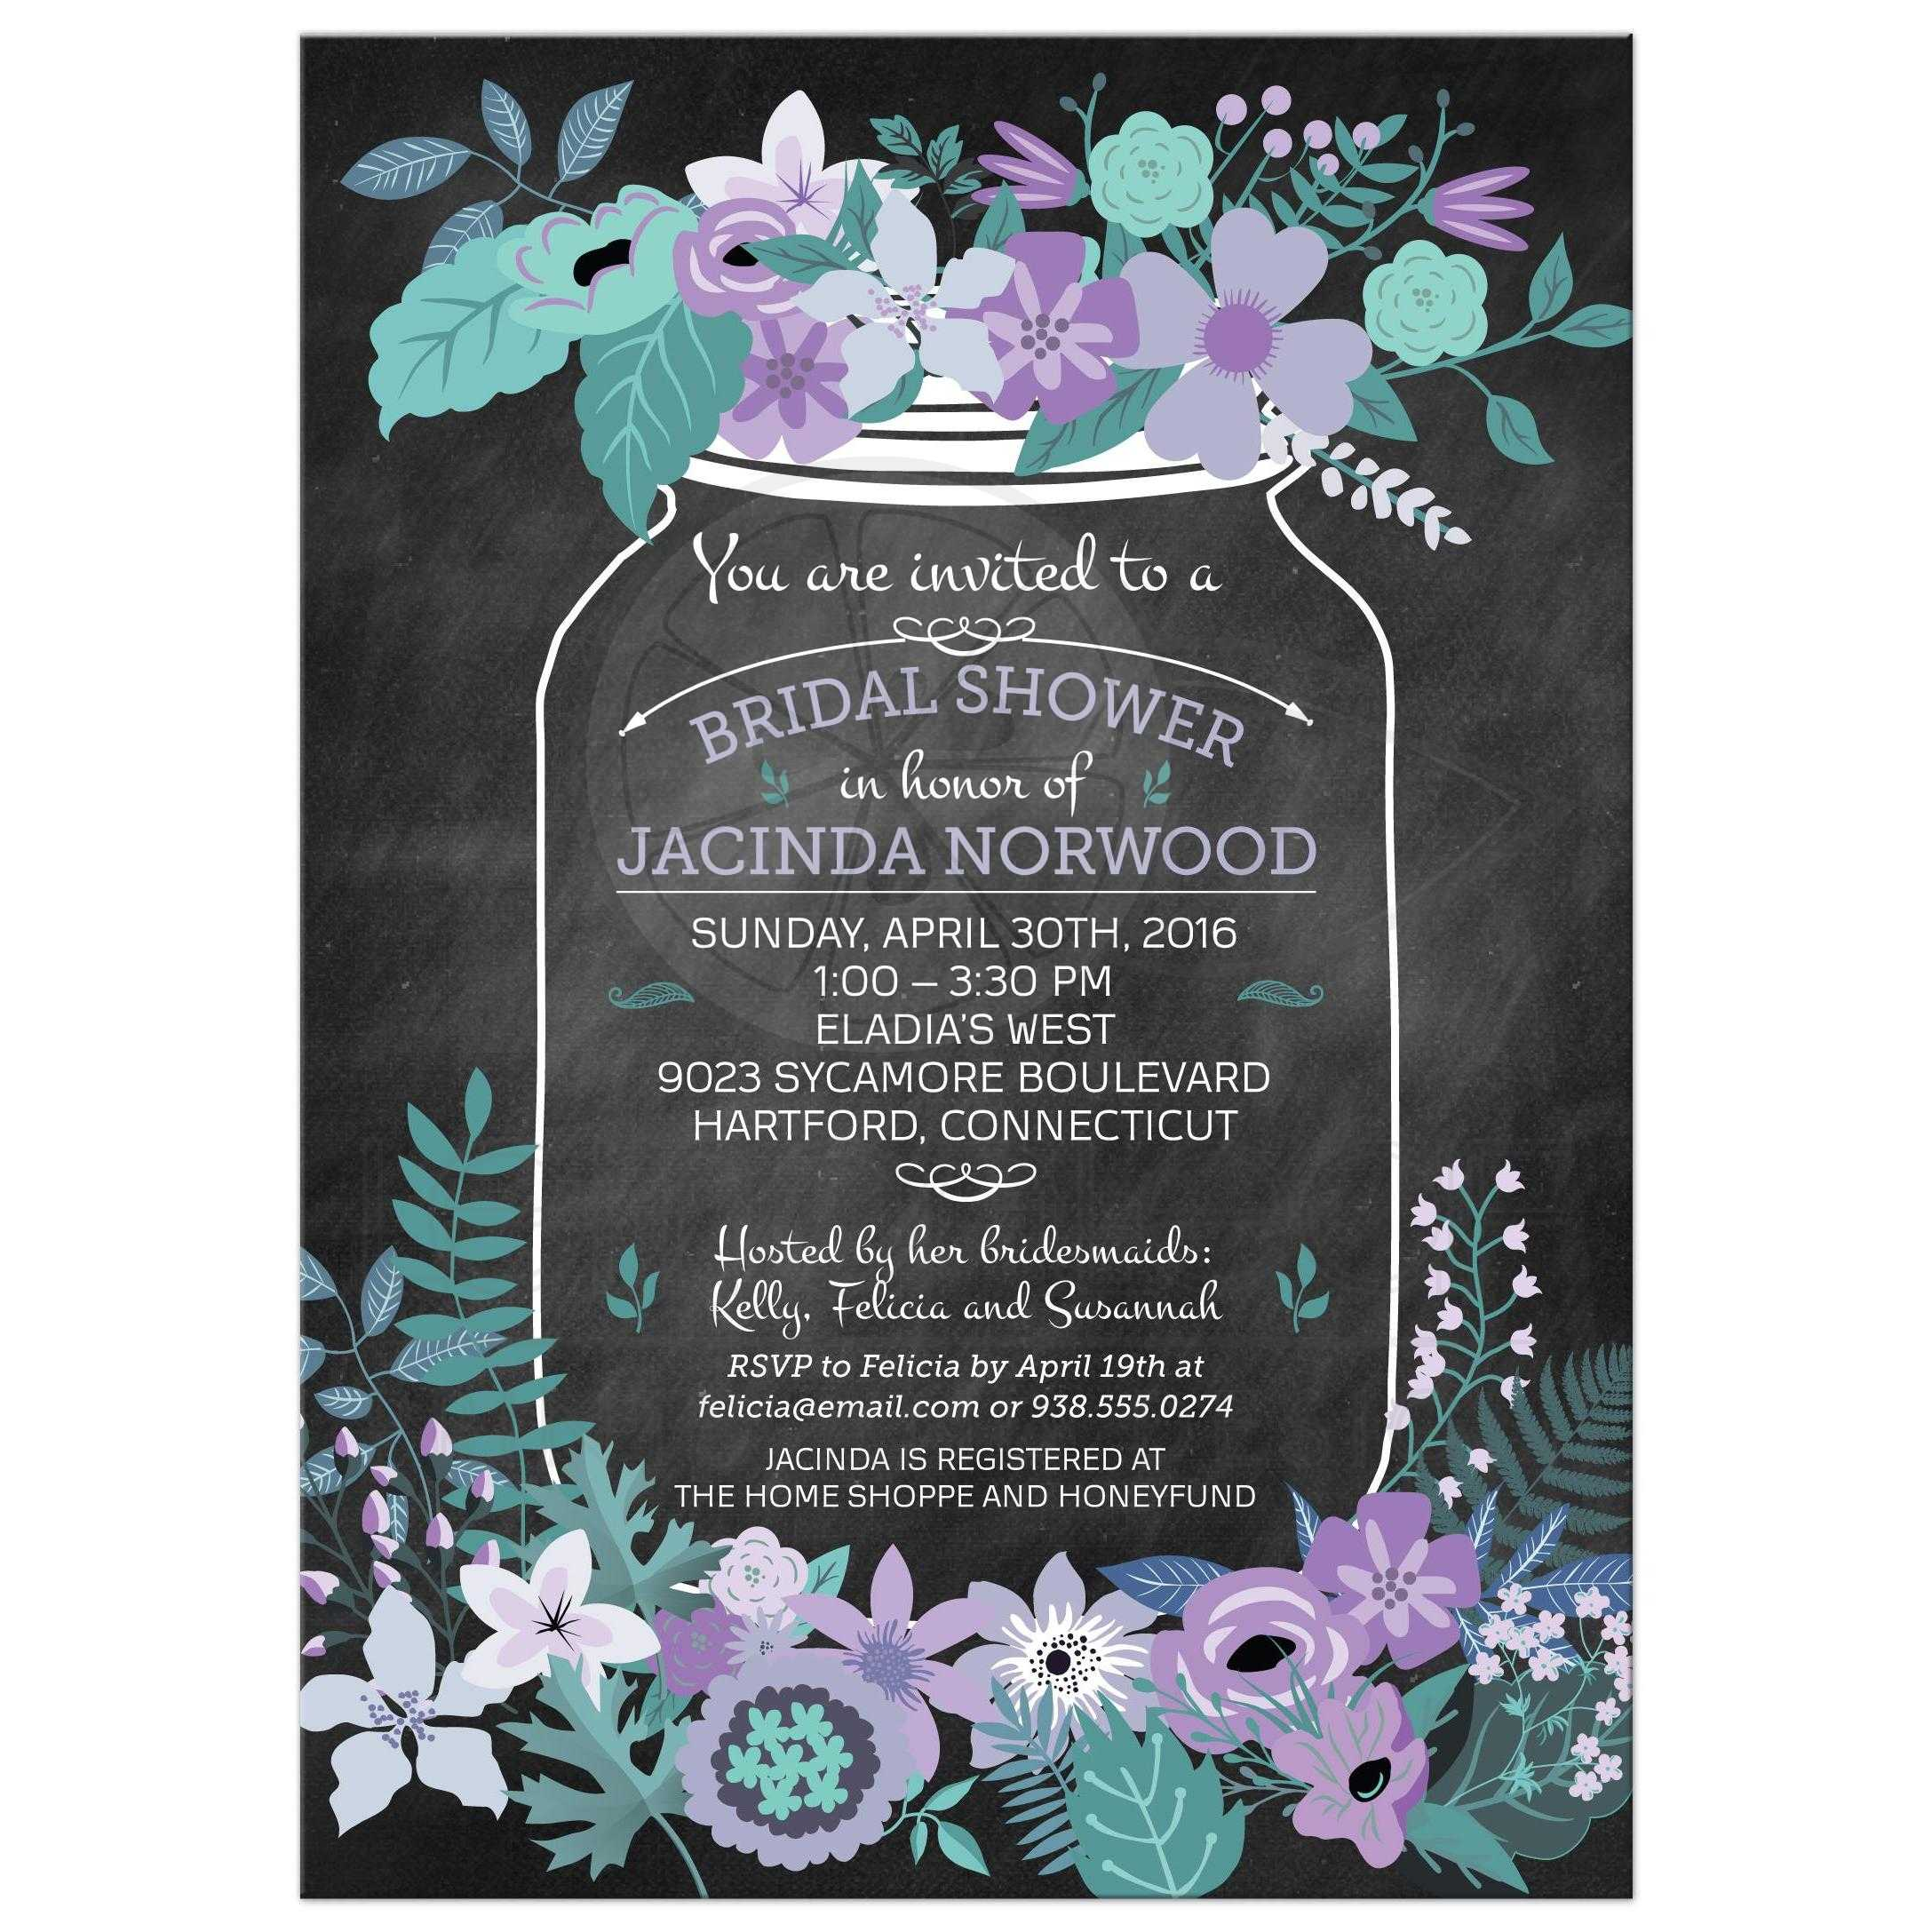 Bridal Shower Invitations Chalkboard was amazing invitation sample